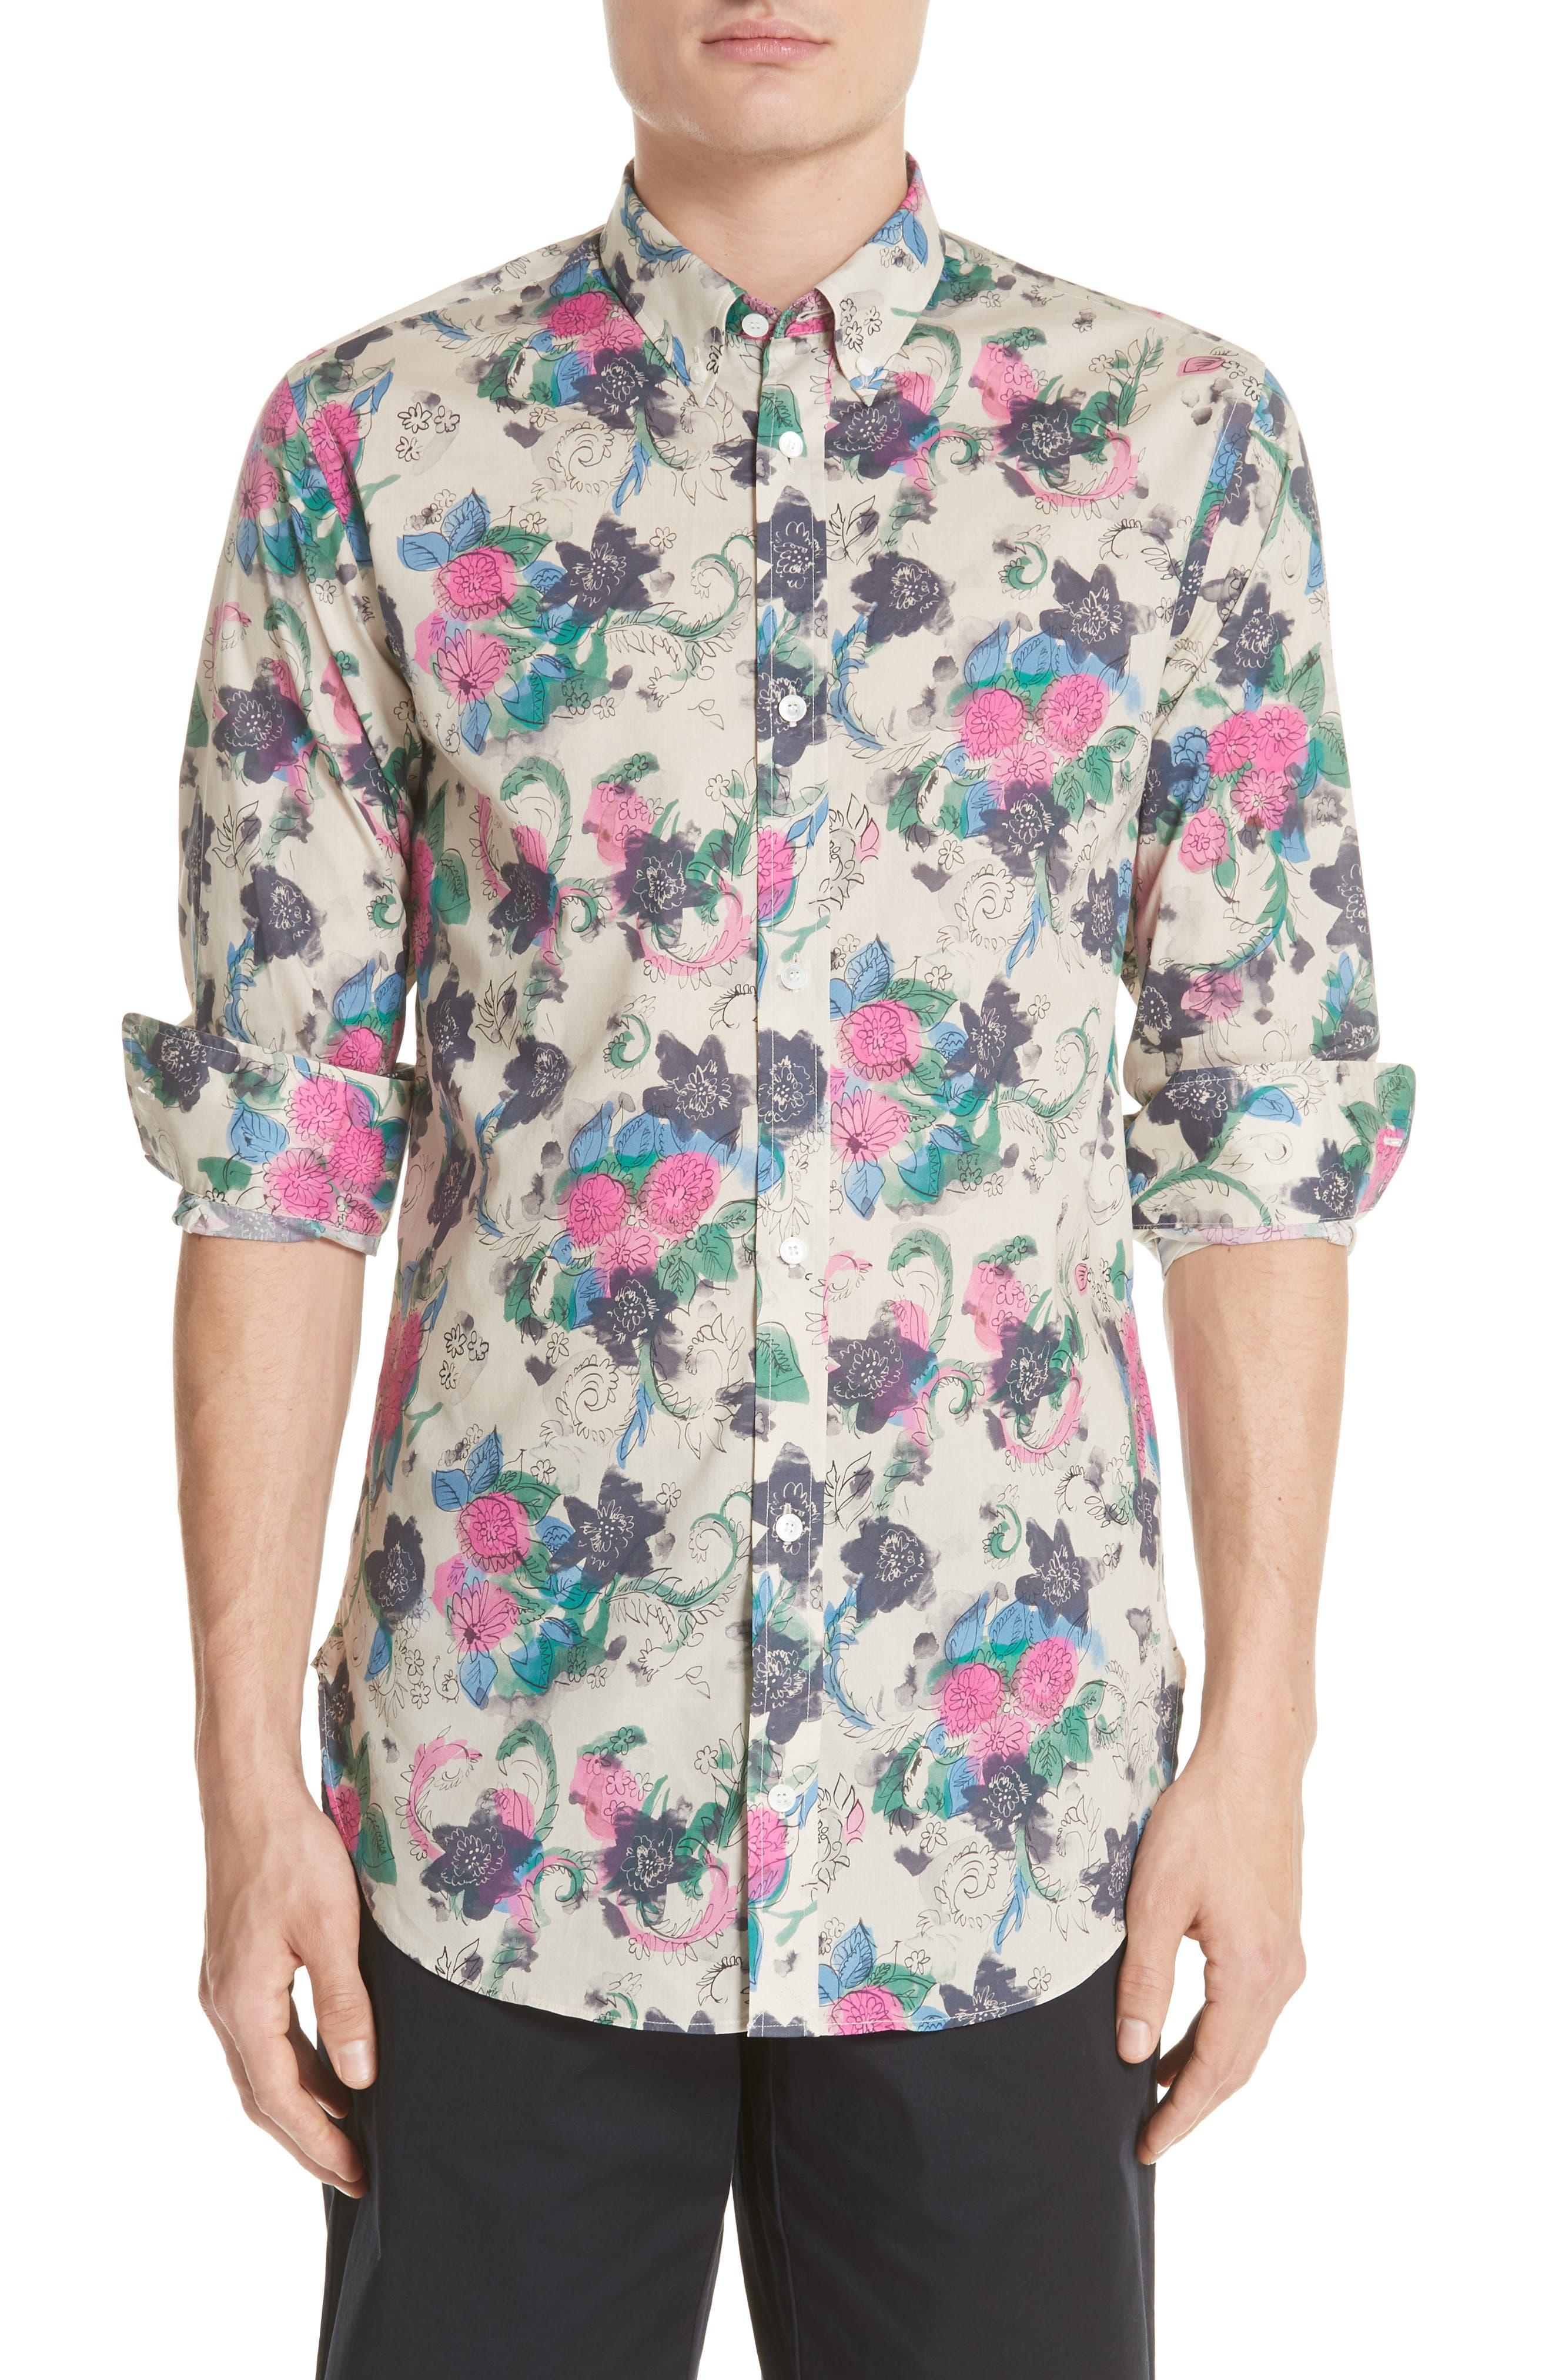 Strenton Floral Print Shirt,                             Main thumbnail 1, color,                             250